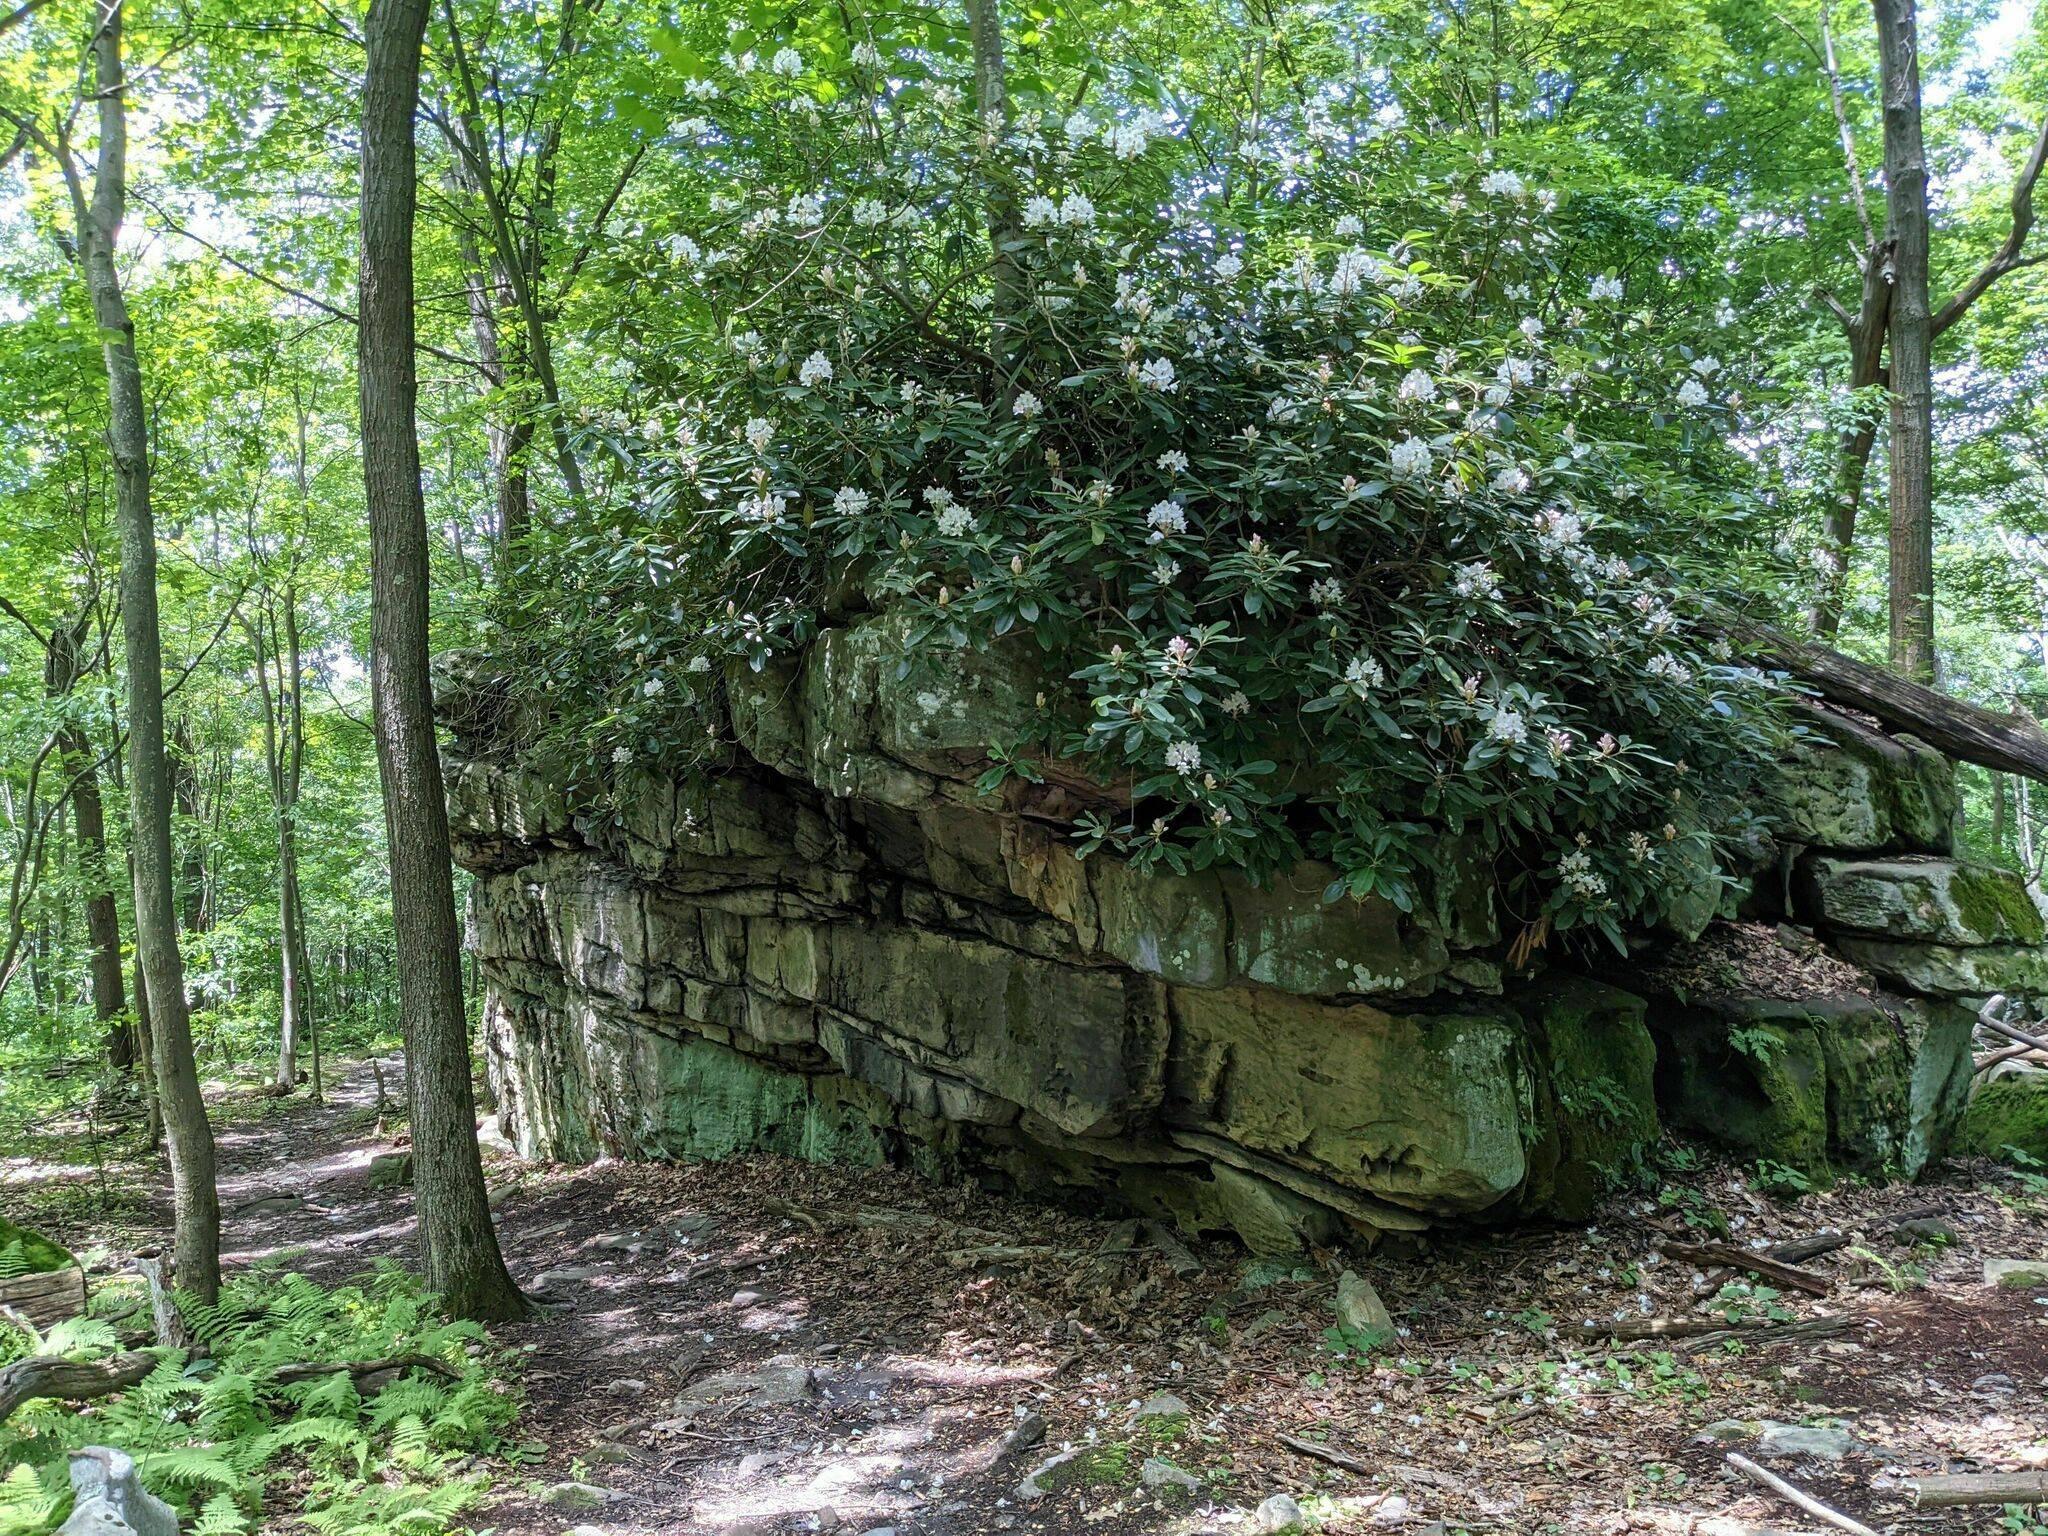 McCune Trail in Ohiopyle State Park, Ohiopyle, PA